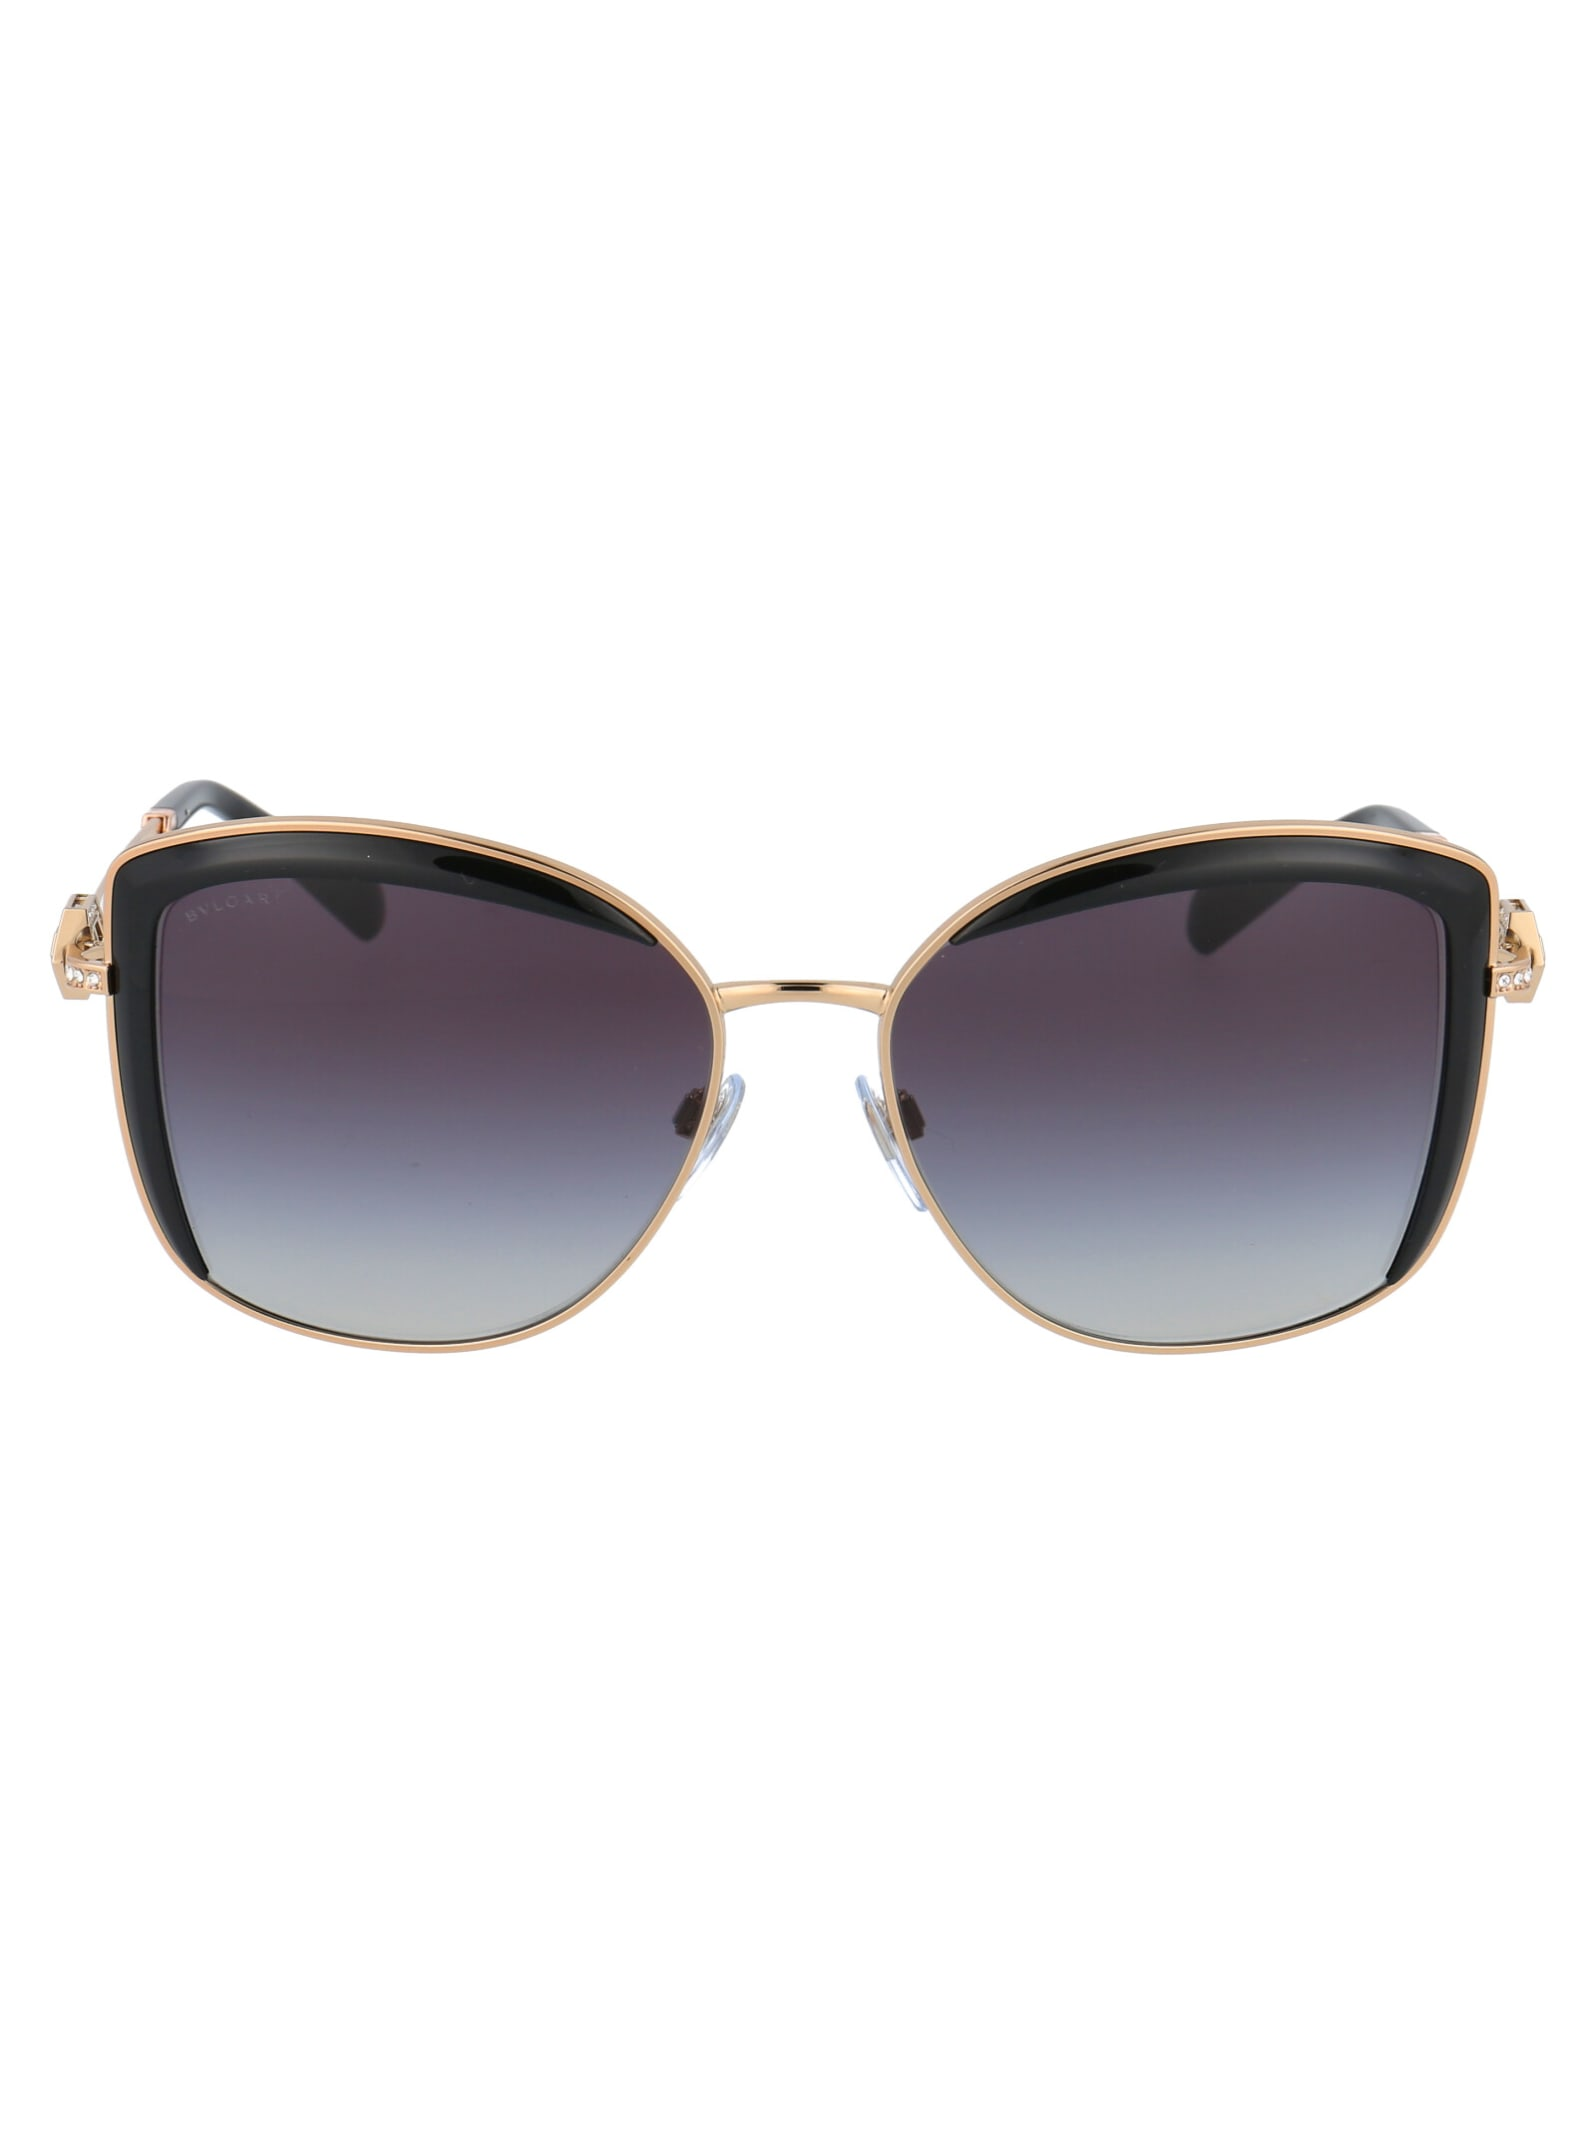 0bv6128b Sunglasses